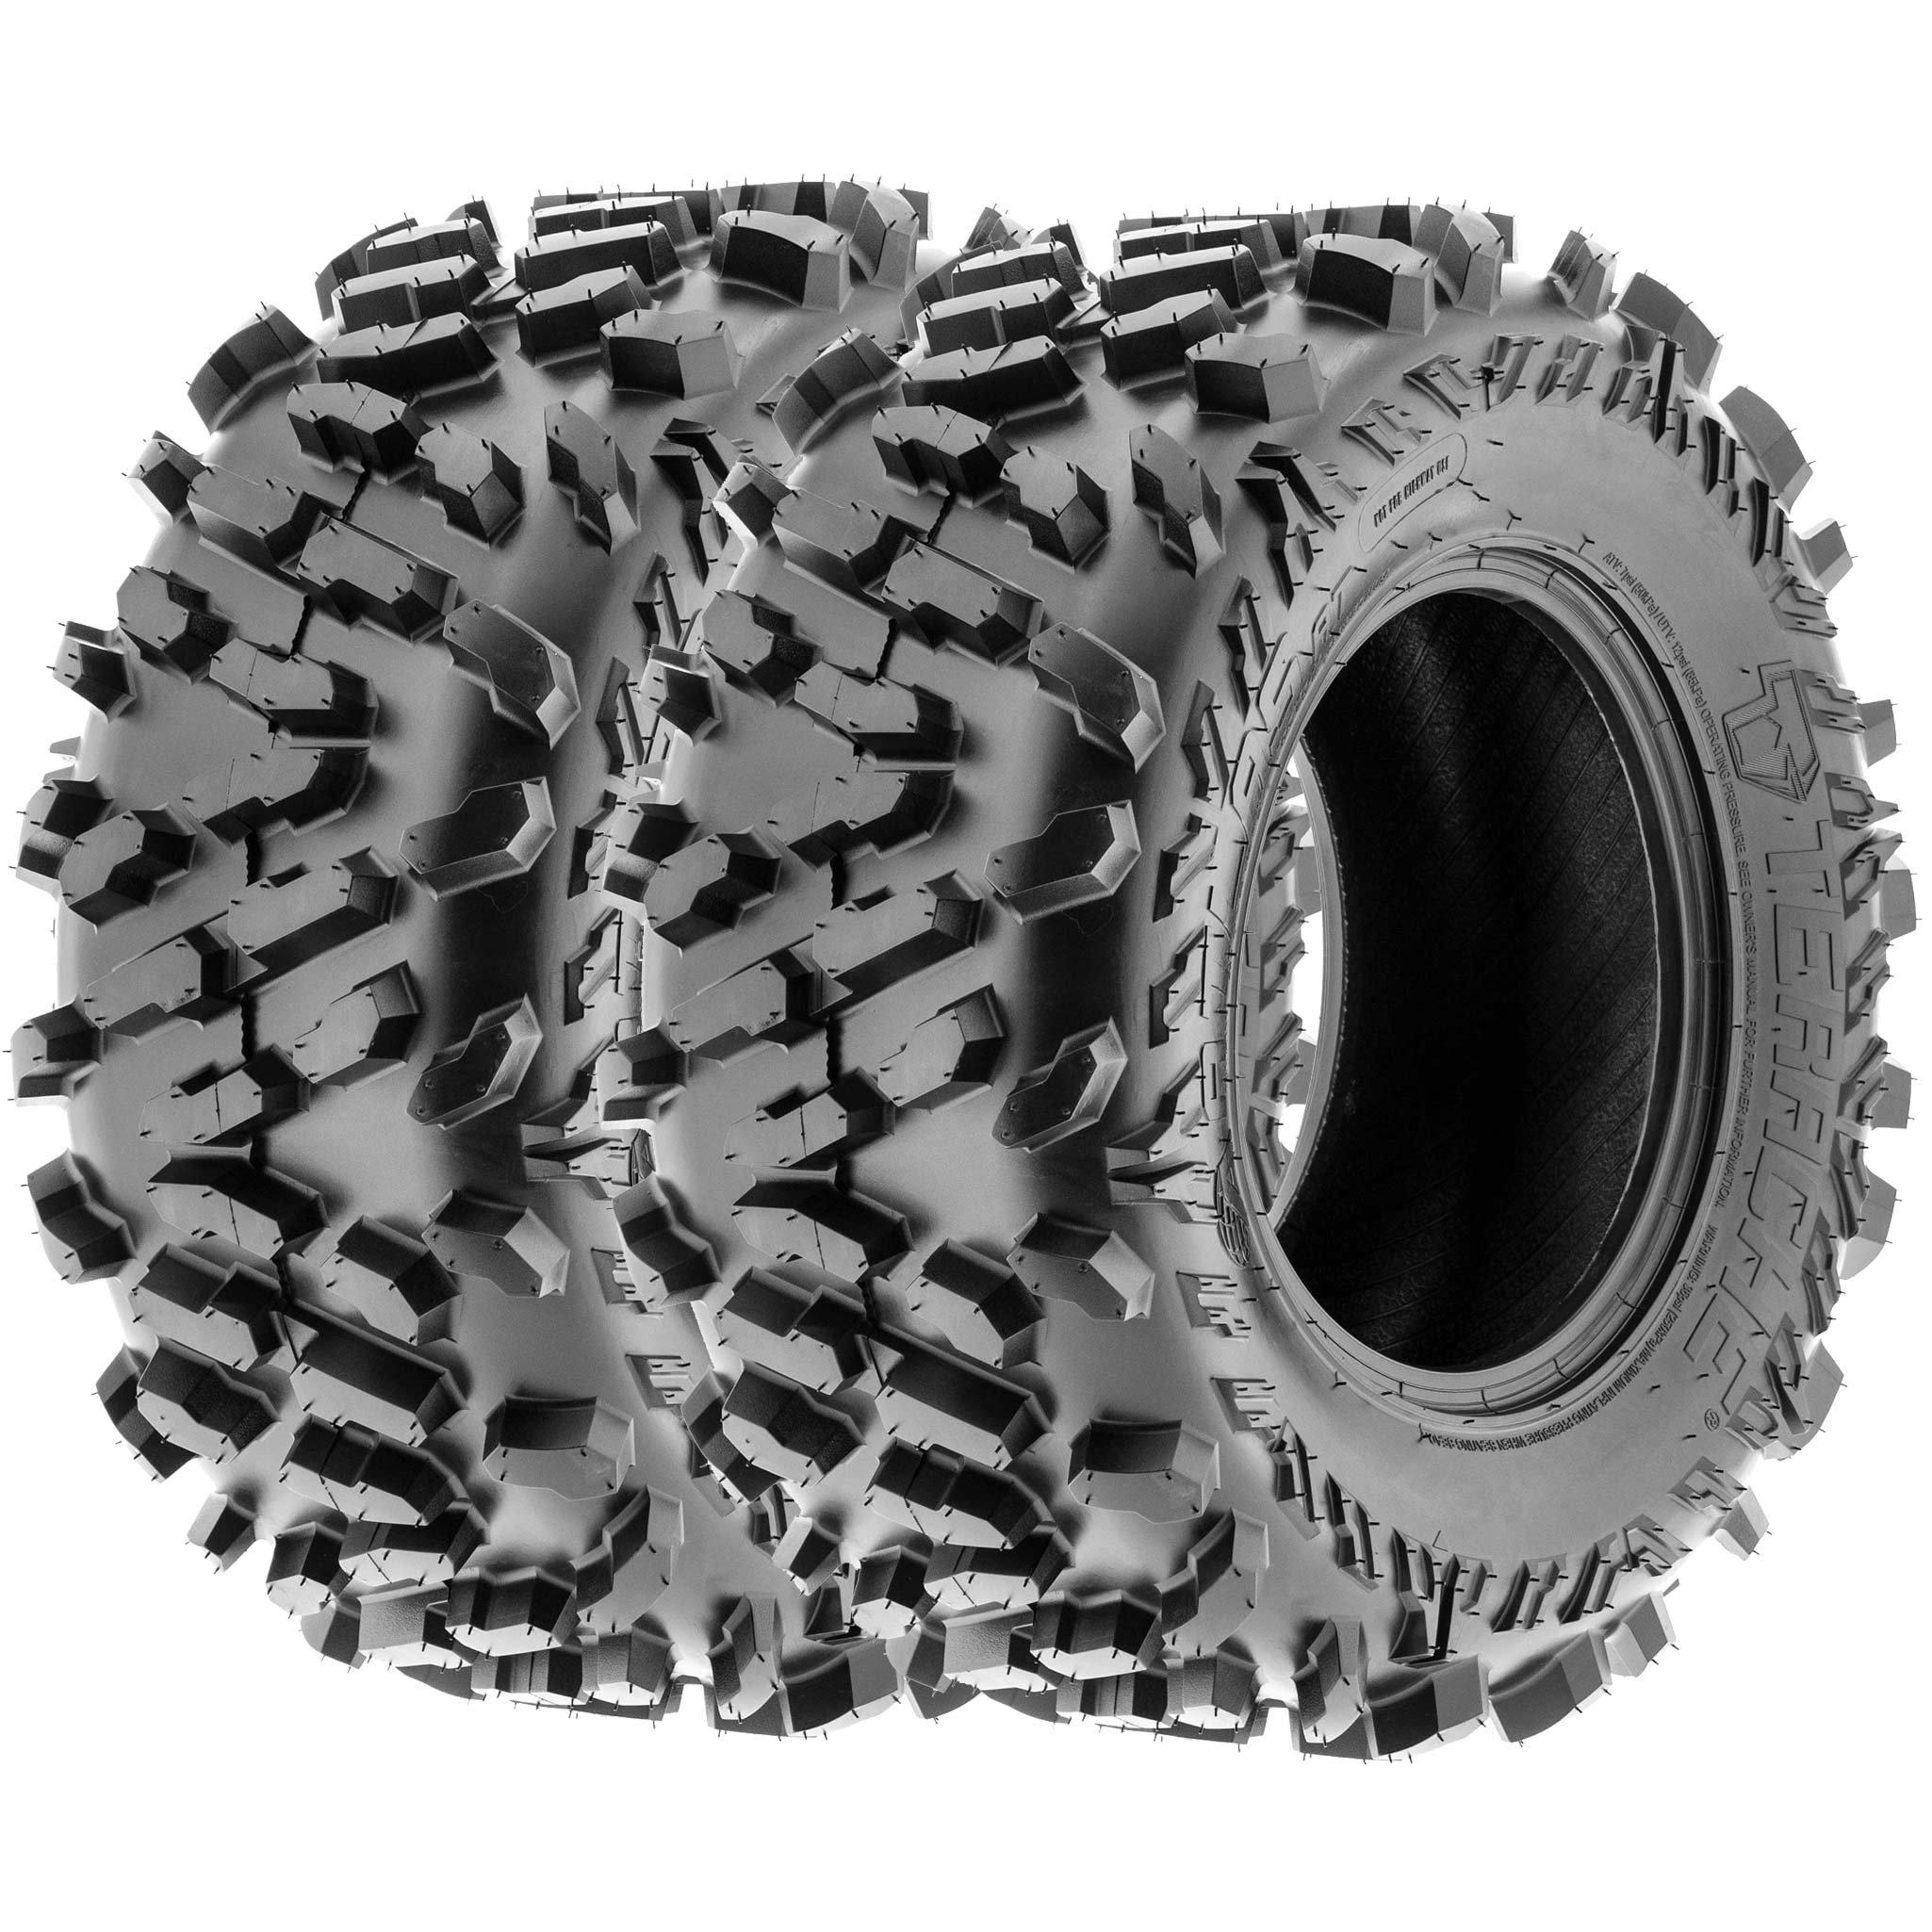 TERACHE Atlas ATV UTV A/T Tires 27x11-14 27x11x14 Tubeless Race Premium 6 Ply, [Set of 2]